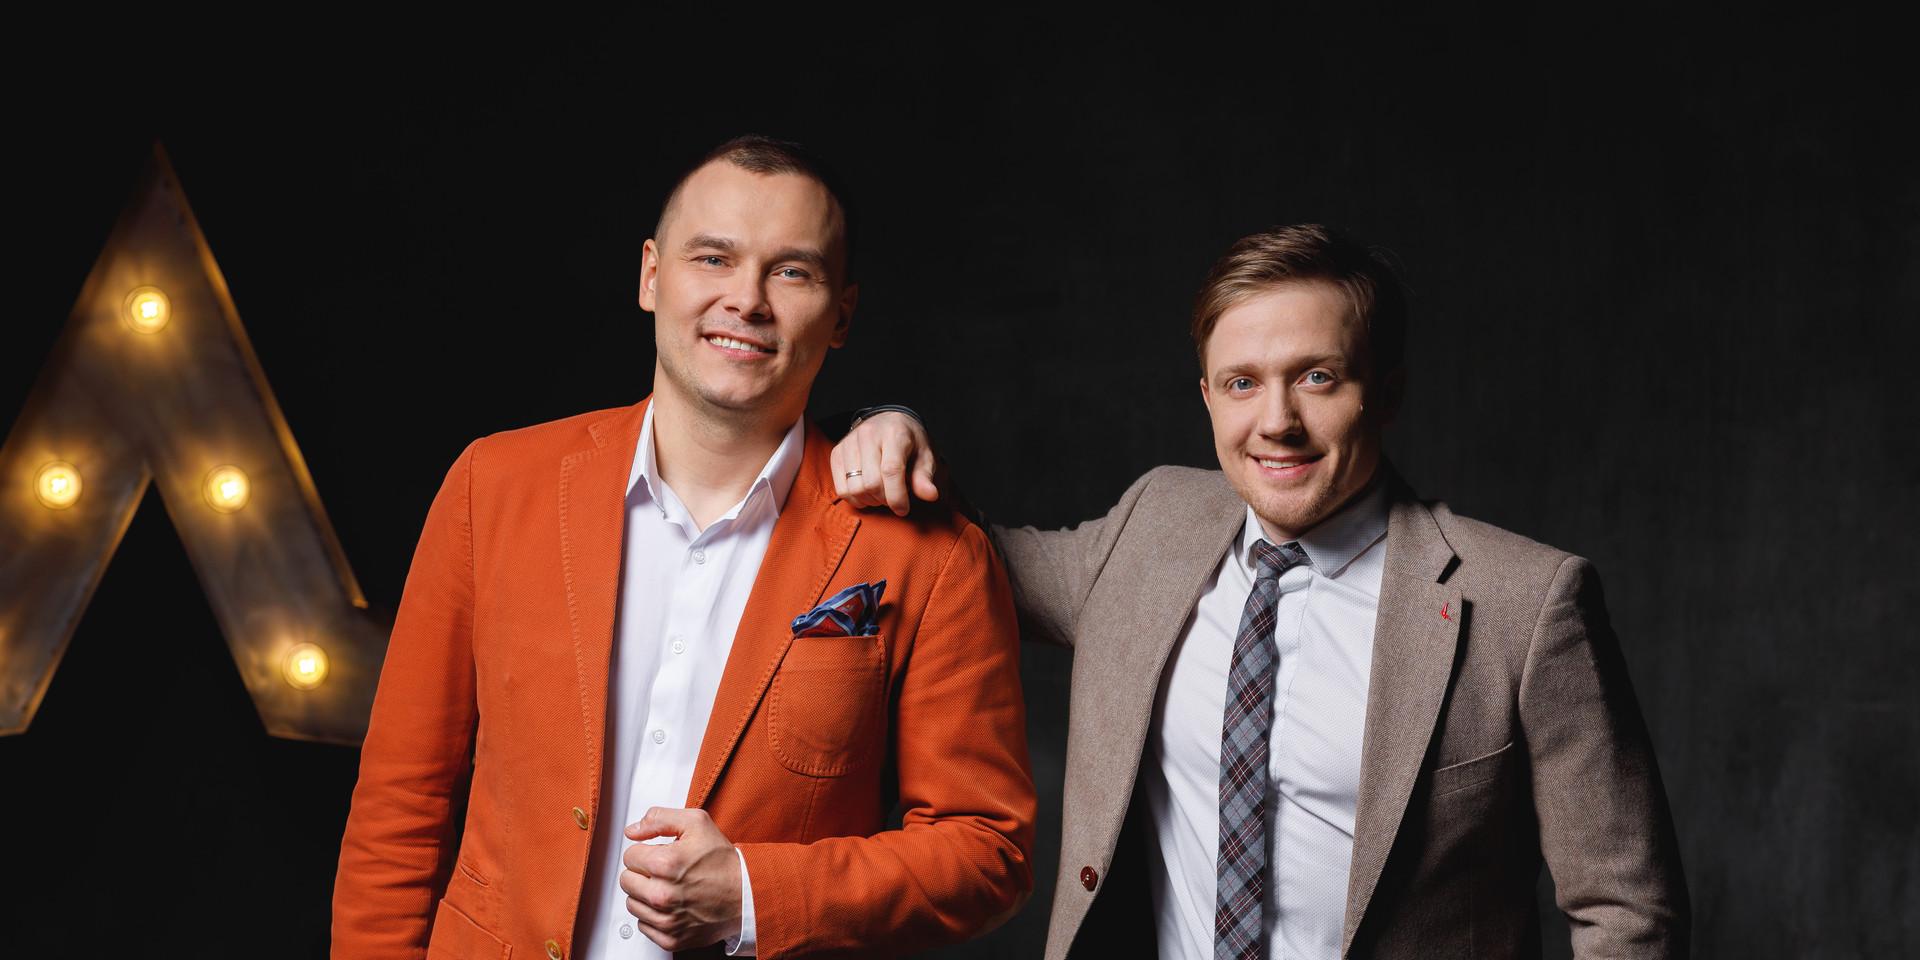 Айдар Гараев и Виктор Щетков